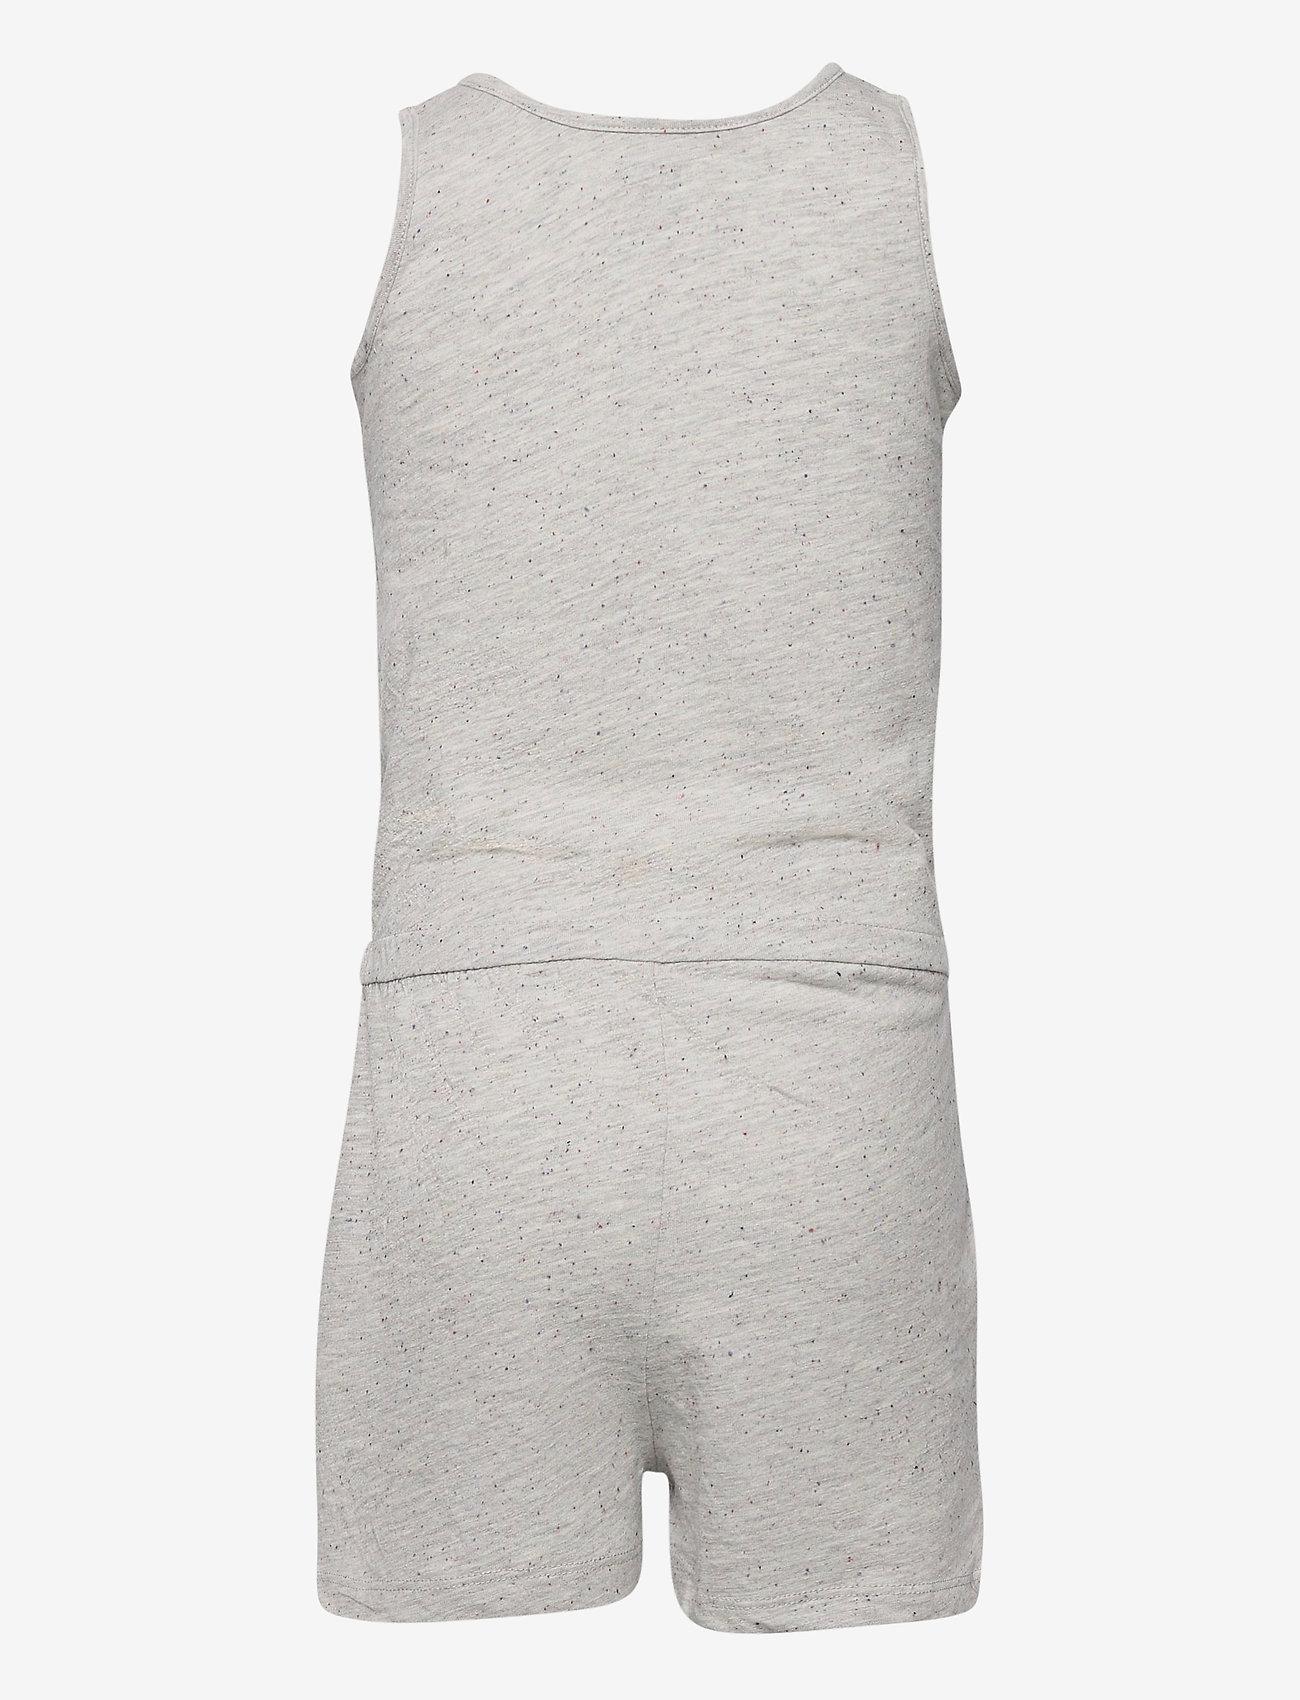 Levi's - LVG KNIT ROMPER - jumpsuits - grey heather - 1